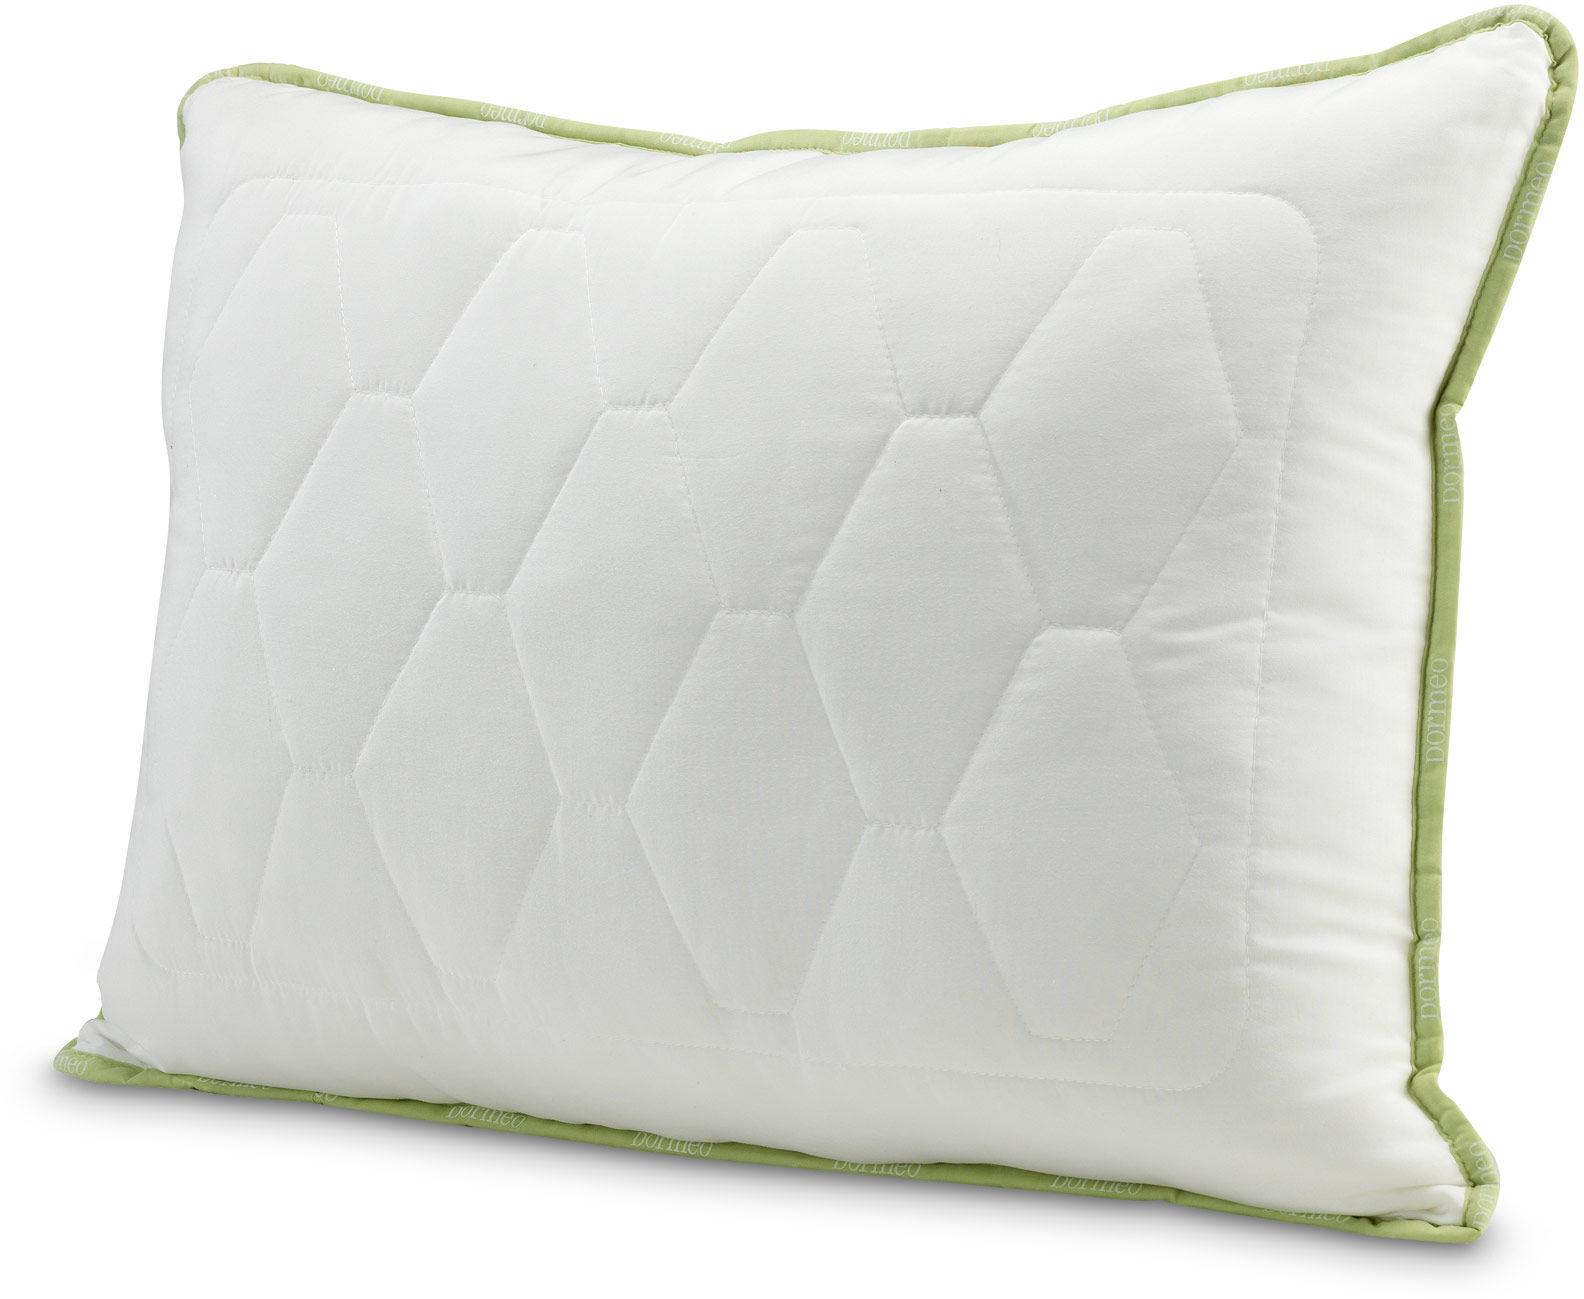 Dormeo Poduszka klasyczna Aloe Vera